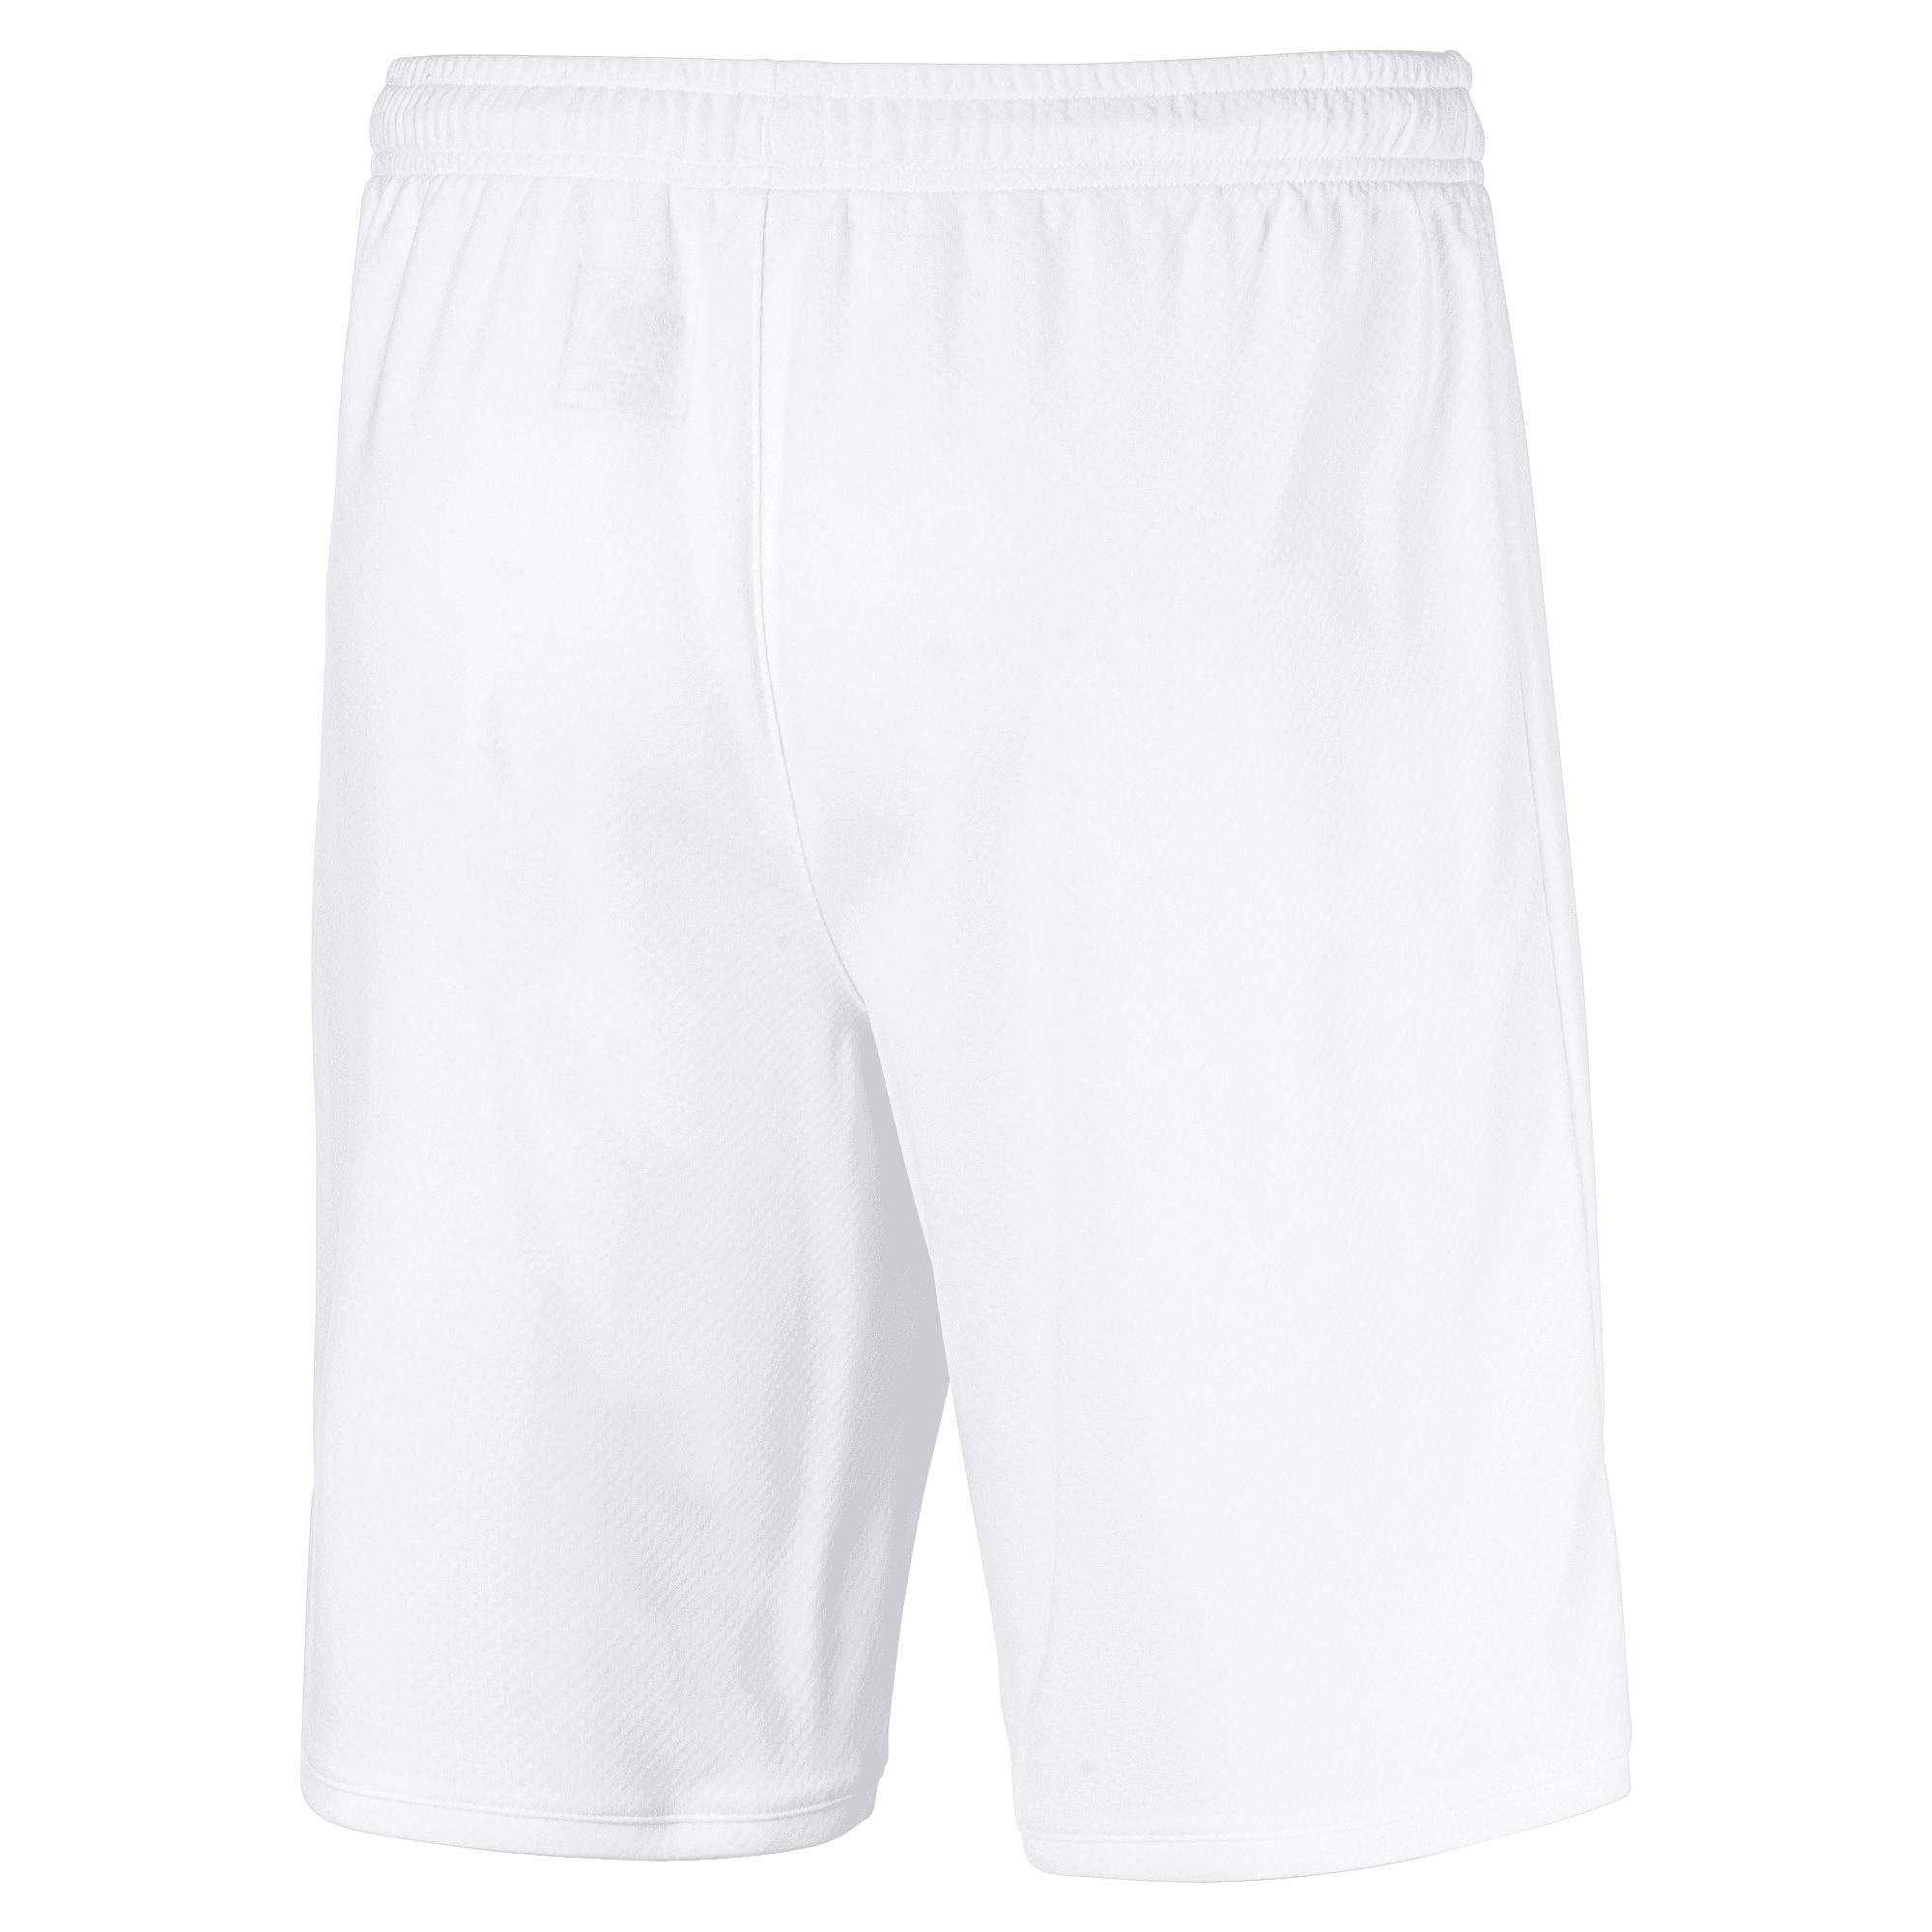 Thumbnail 2 of Borussia Mönchengladbach Men's Replica Shorts, Puma White, medium